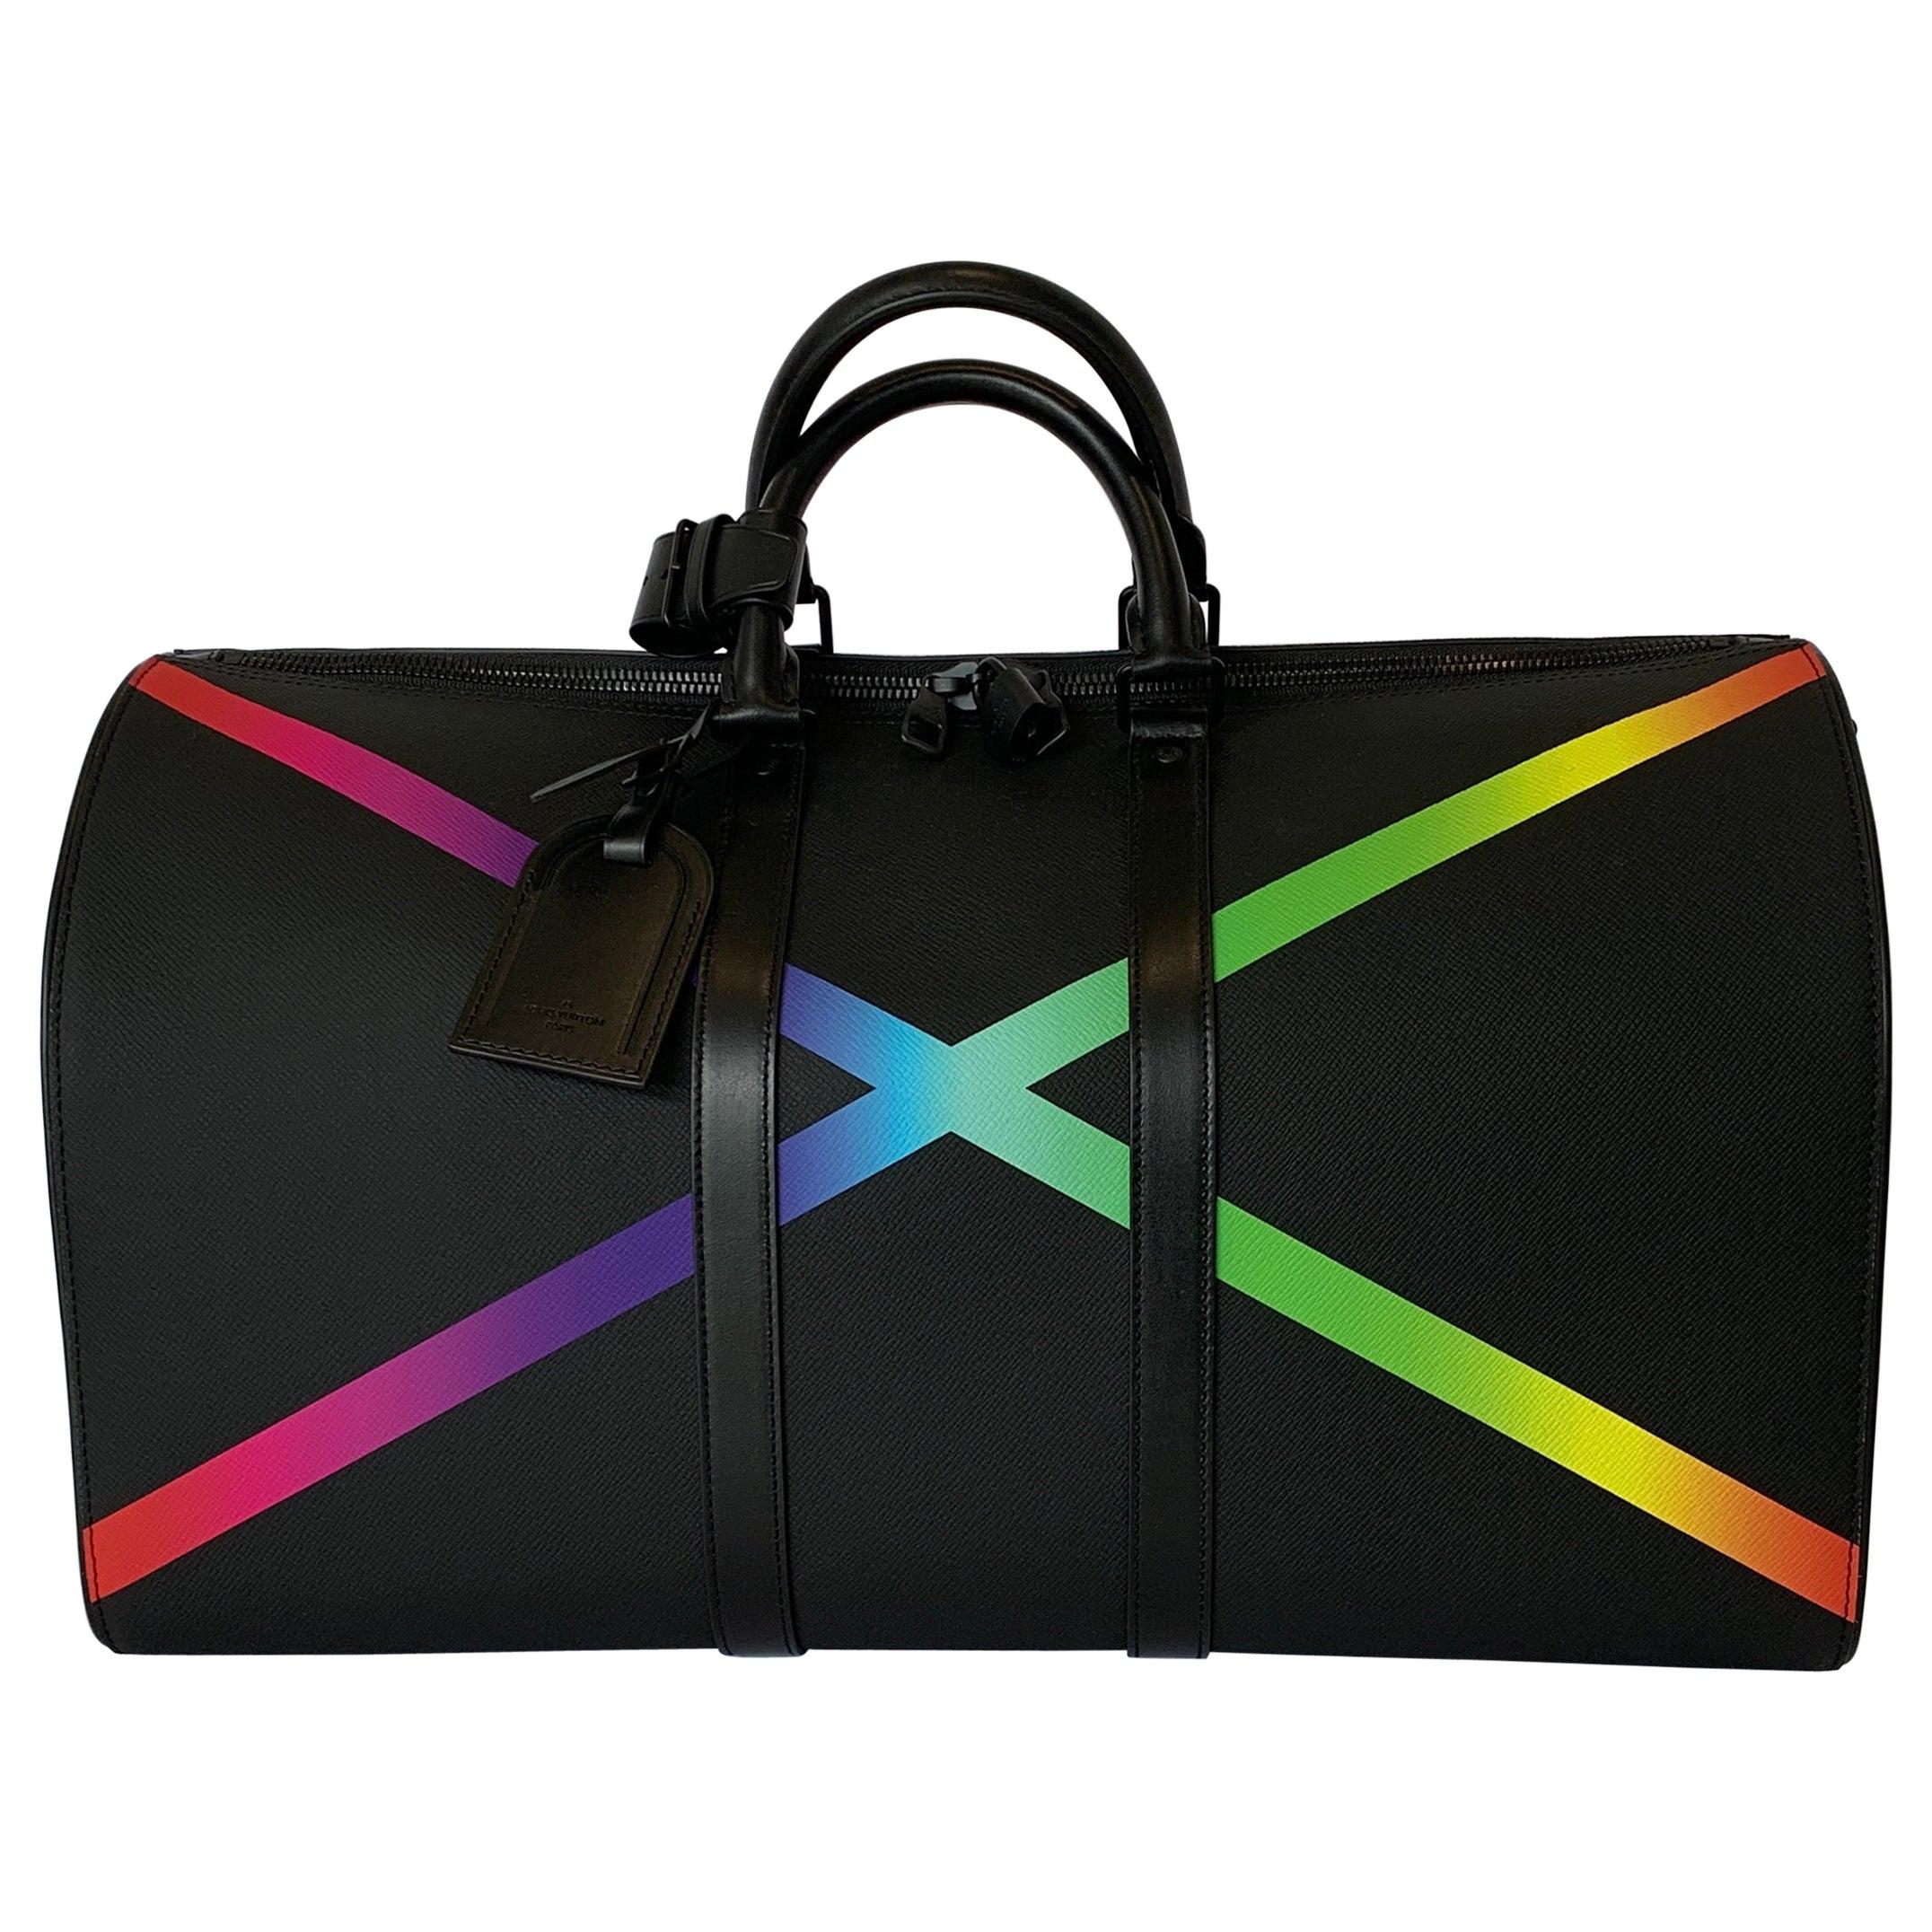 Louis Vuitton Black KEEPALL BANDOULIÈRE 50 Taiga Rainbow